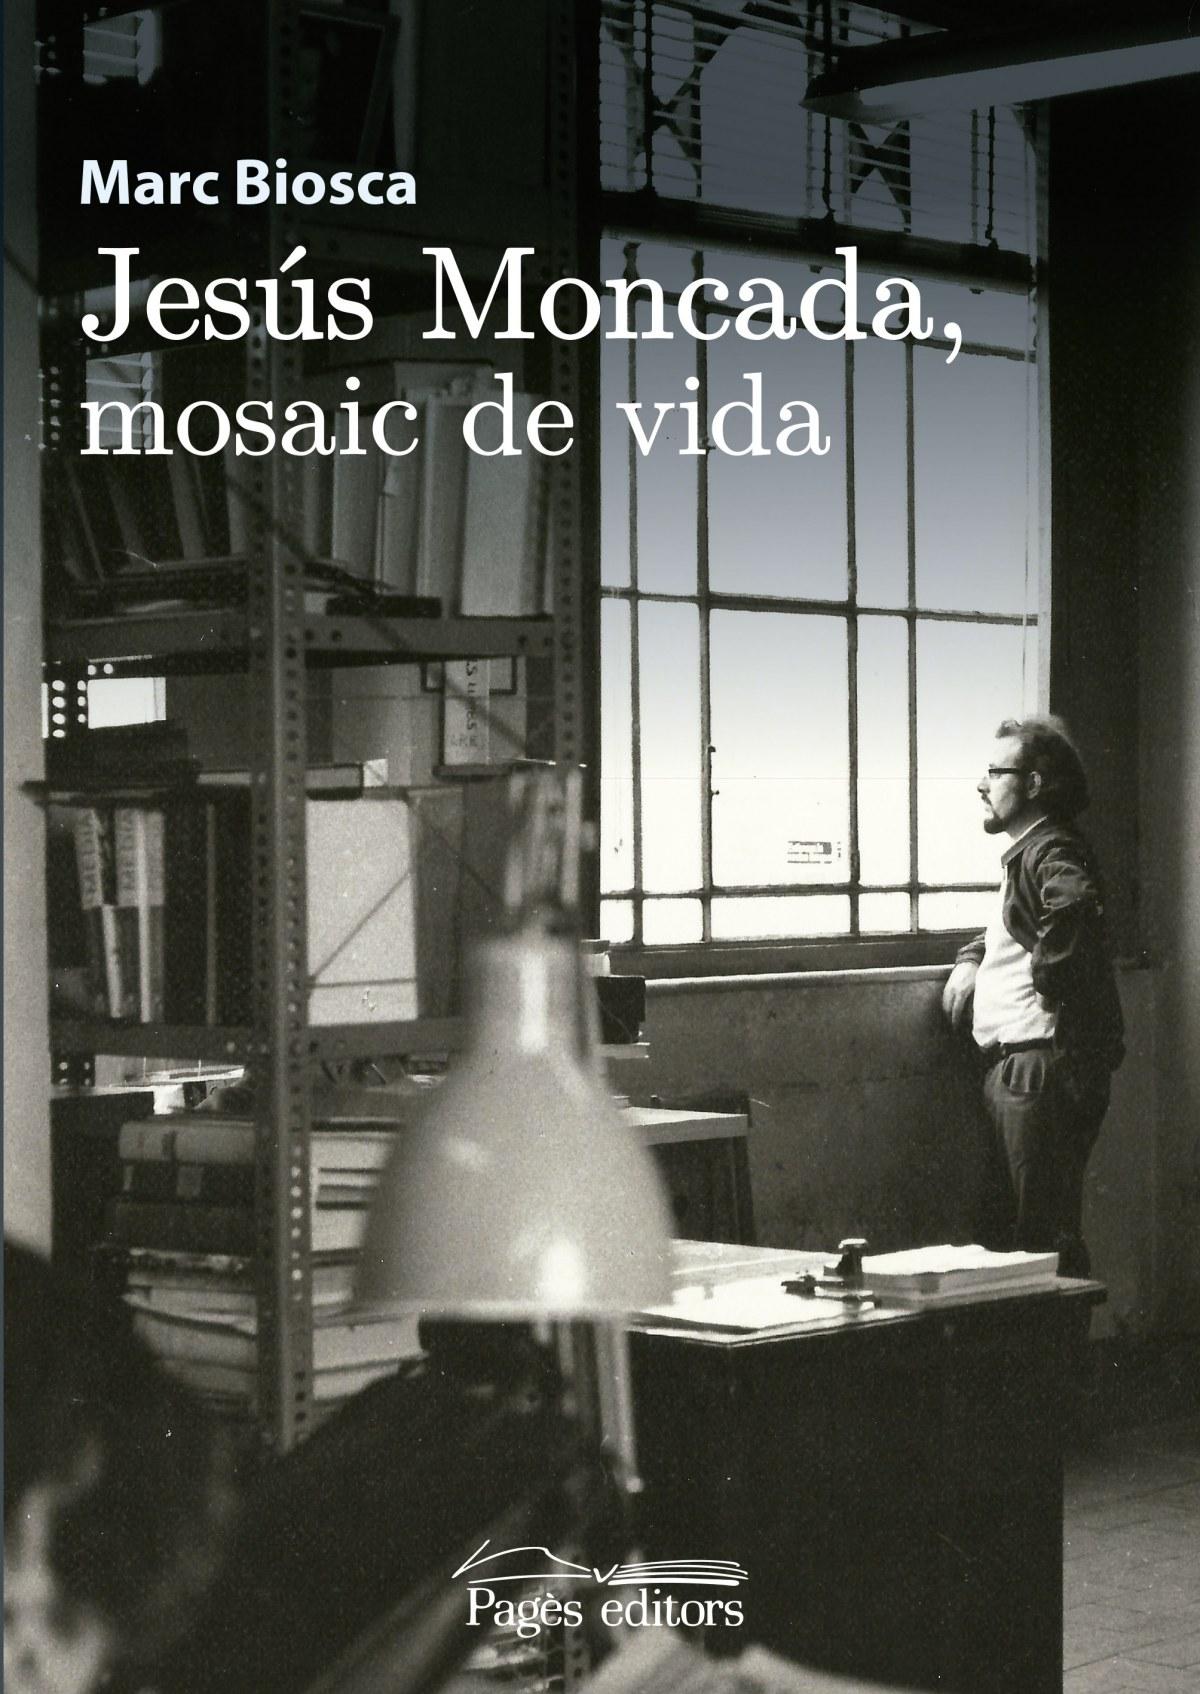 JESÚS MONCADA, MOSAIC DE VIDA 9788499758831